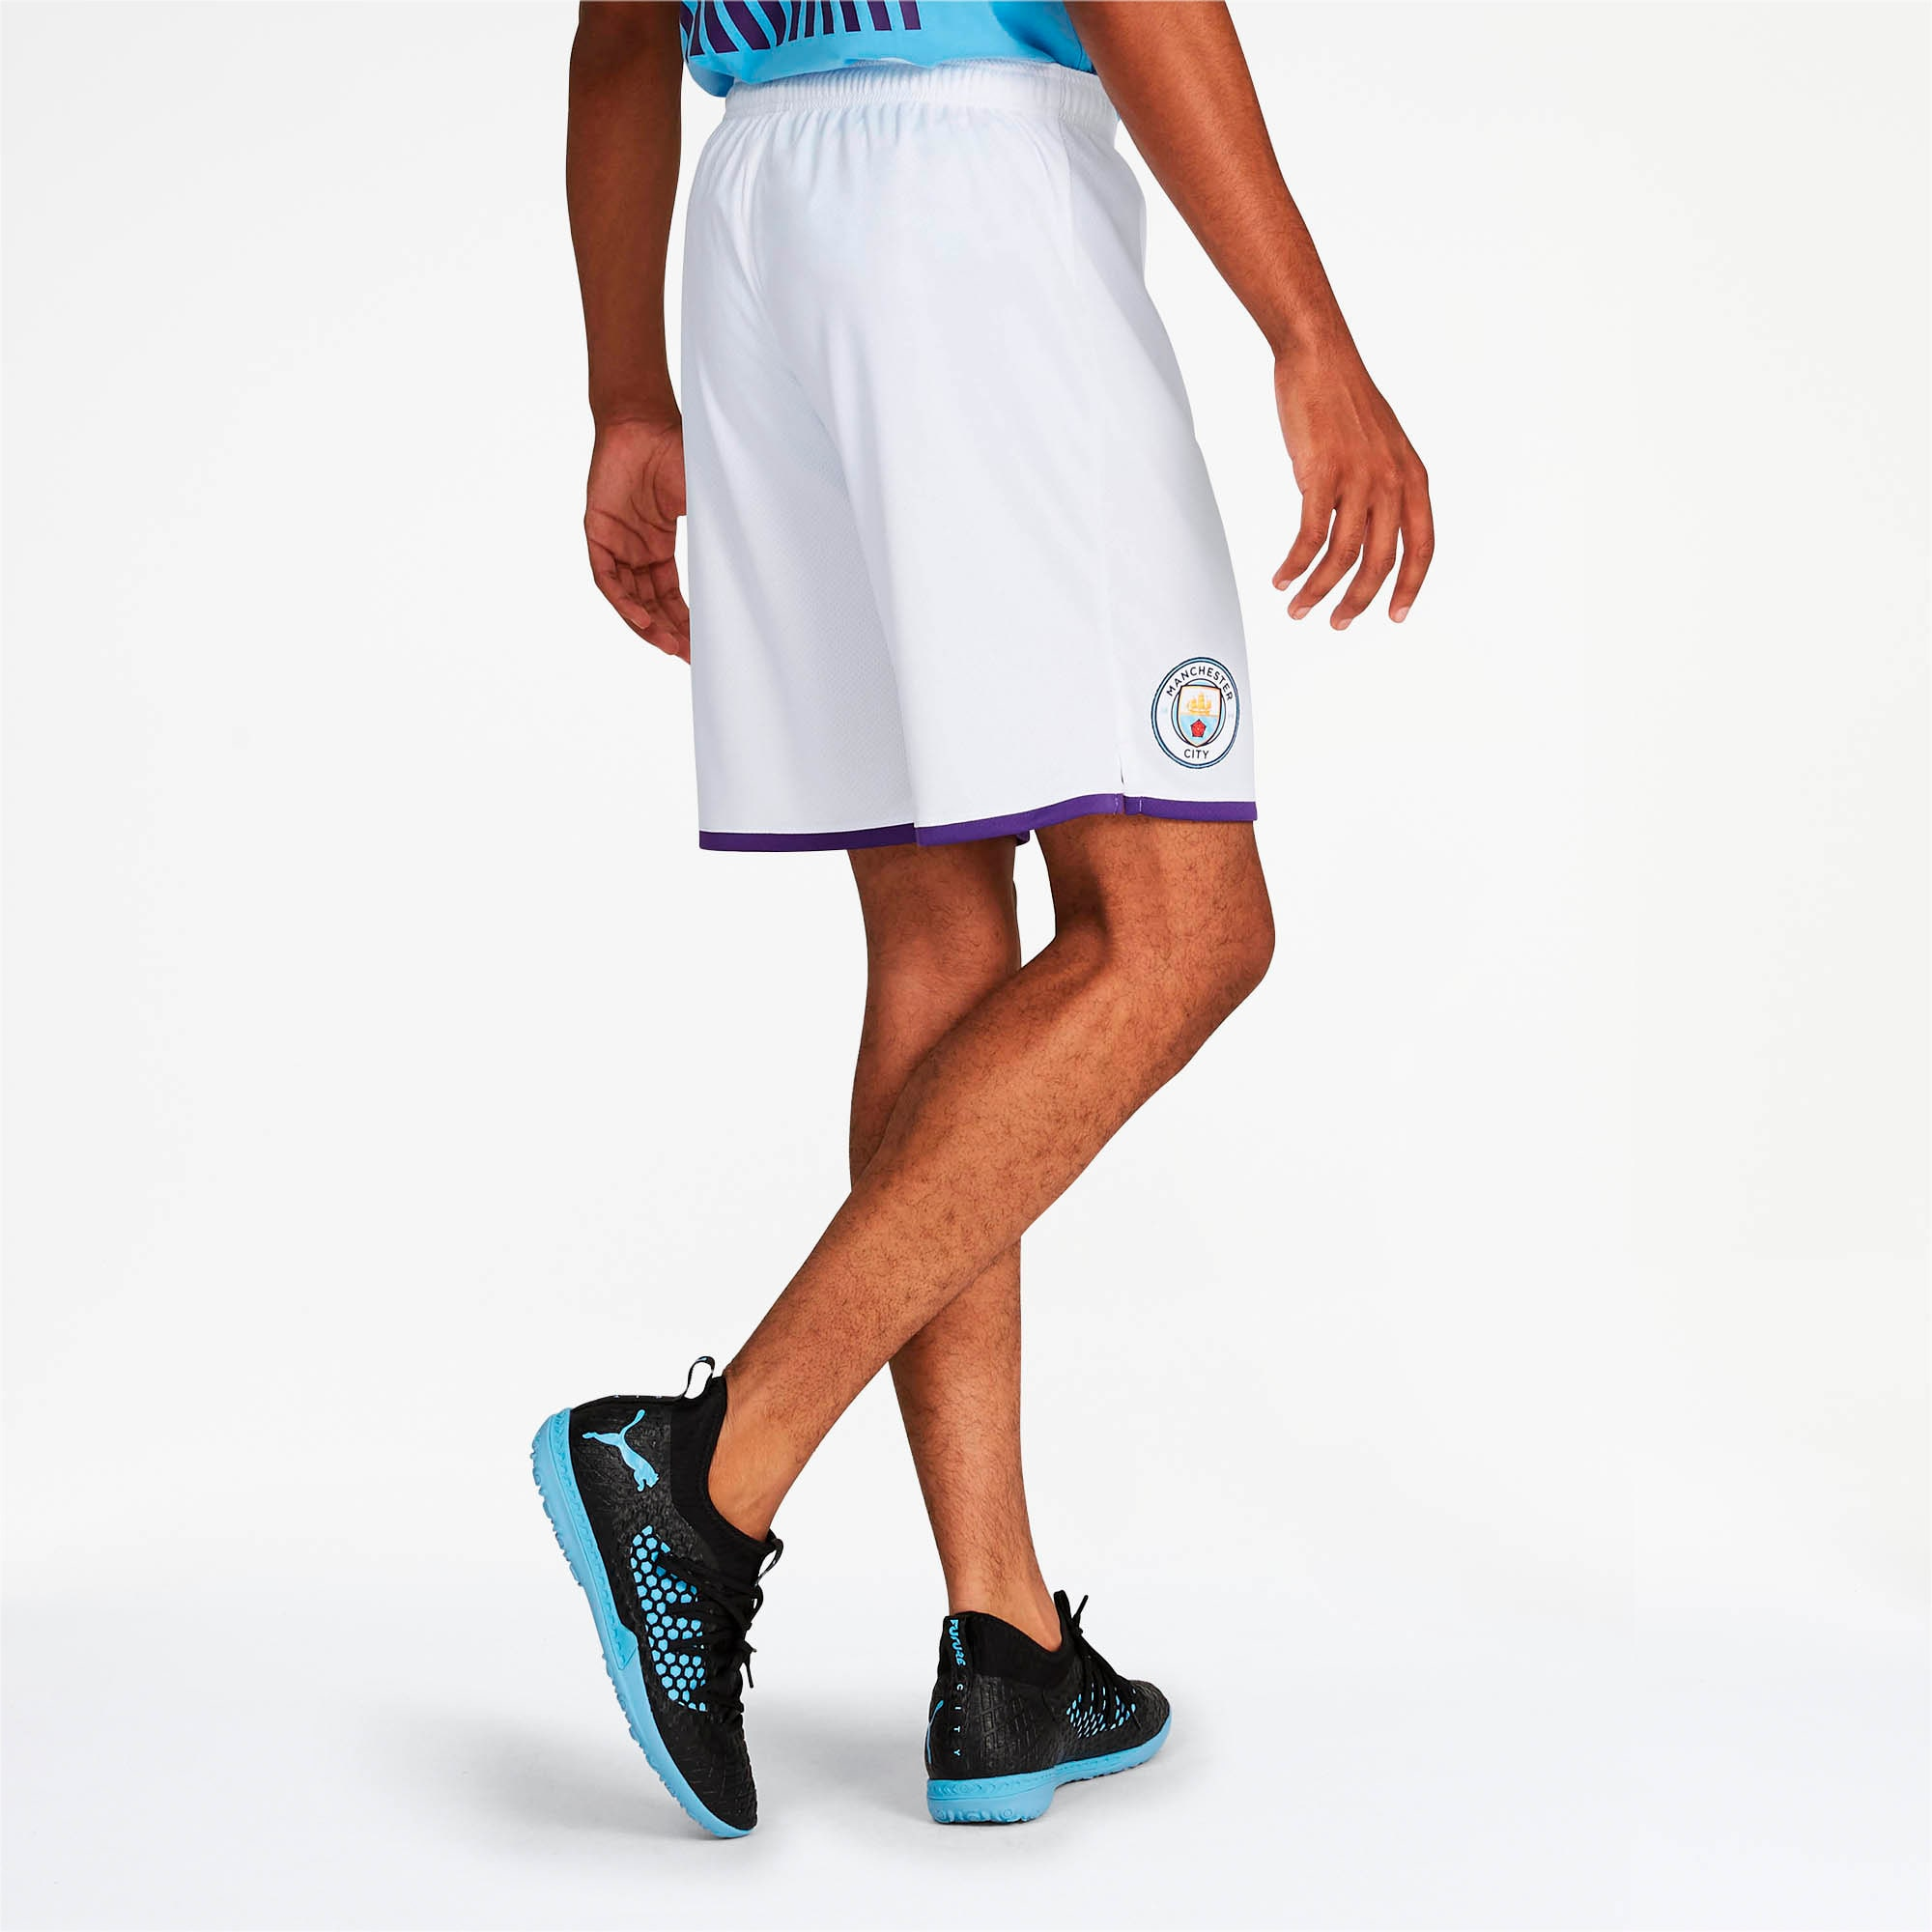 Thumbnail 2 of Manchester City Men's Third Replica Shorts, Puma White-Tillandsia Purple, medium